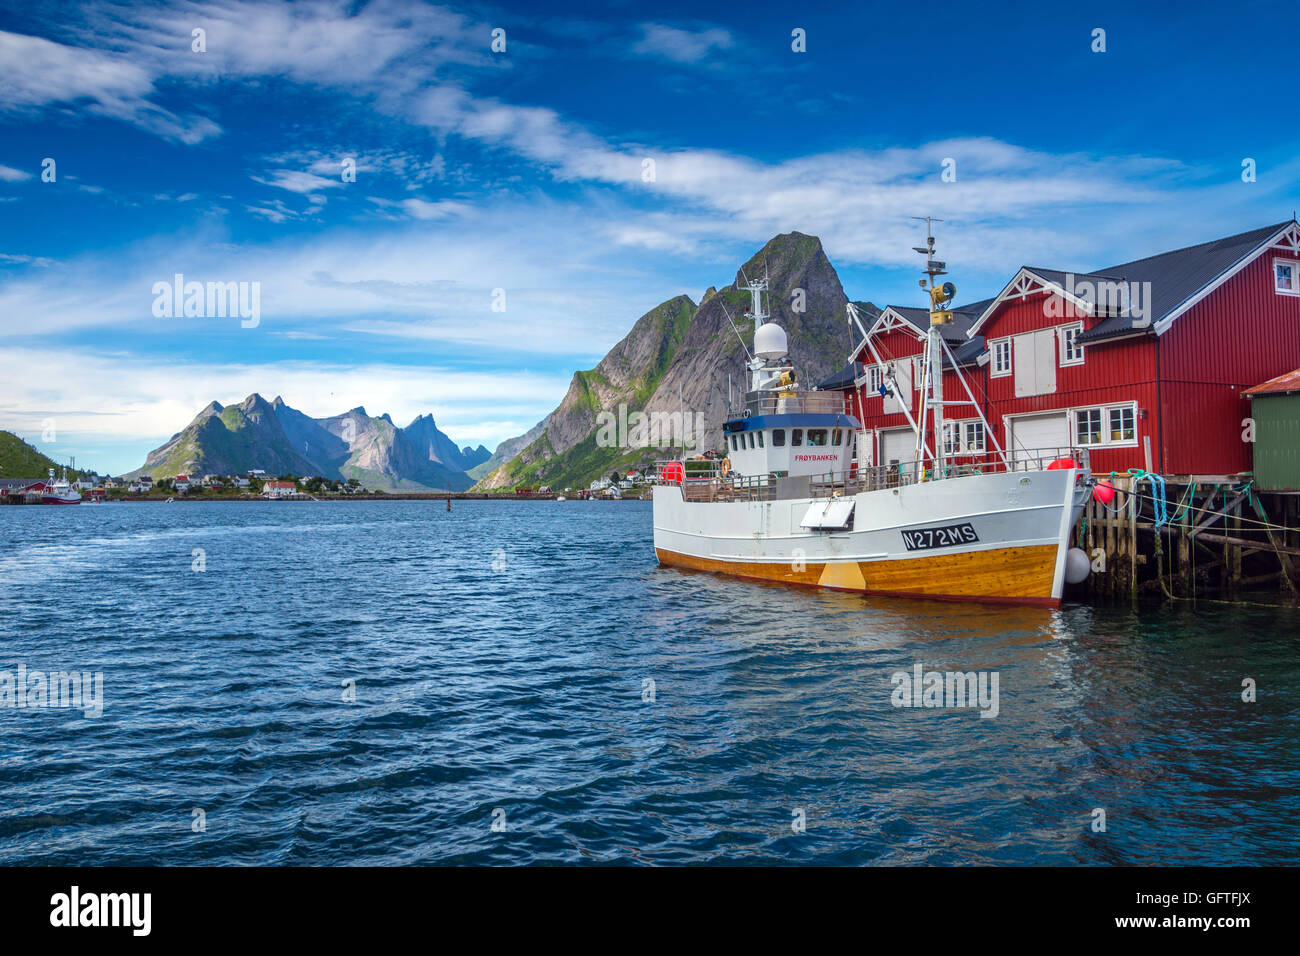 Cod fishing boats, rorbu fishermens cottages, Reine, Lofoten Islands, Norway - Stock Image